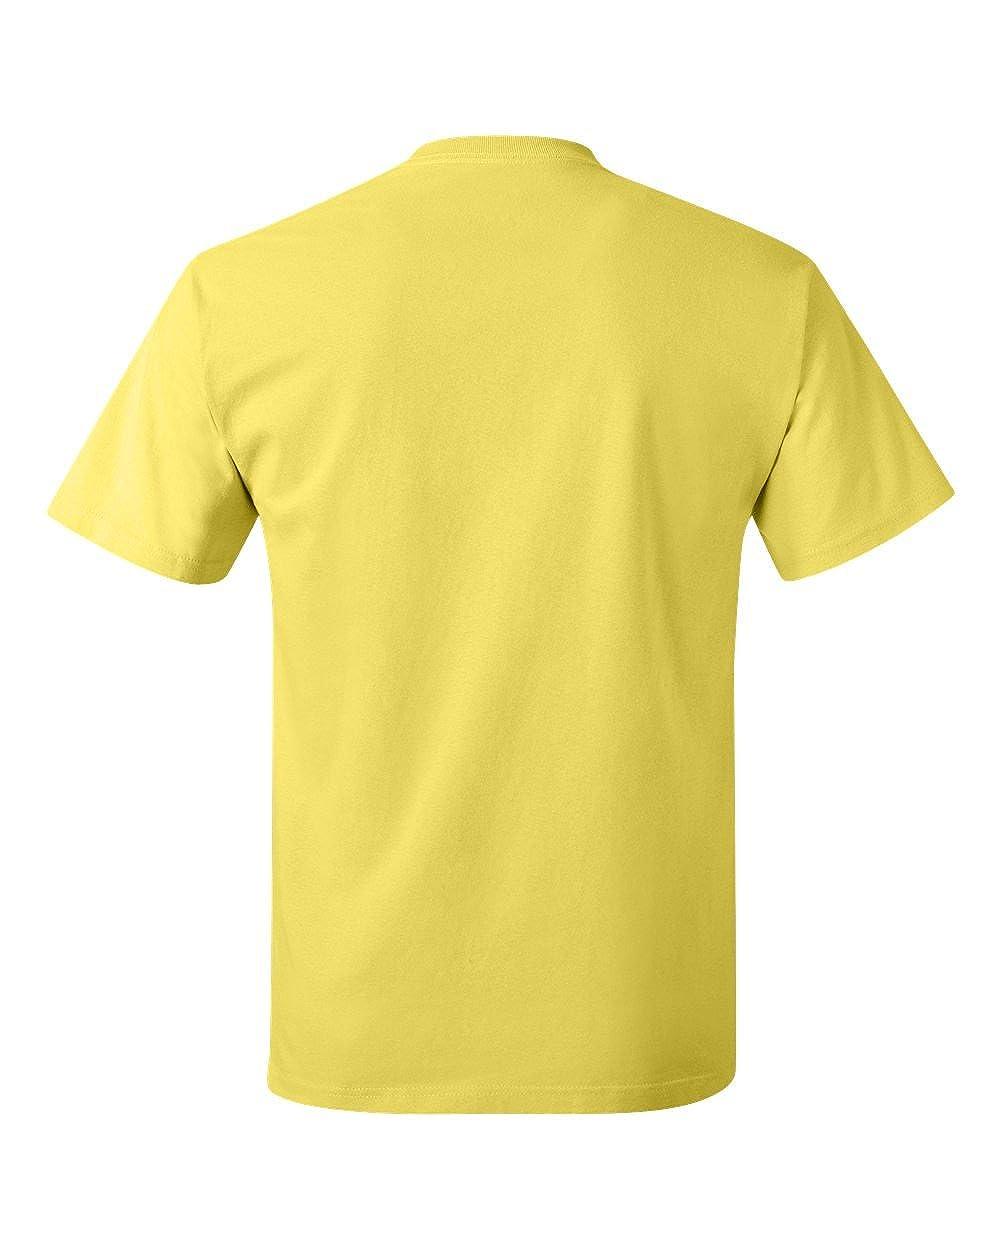 Style # 5250T - Original Label Yellow 4XL - Hanes Mens 61 Oz Tagless T-Shirt